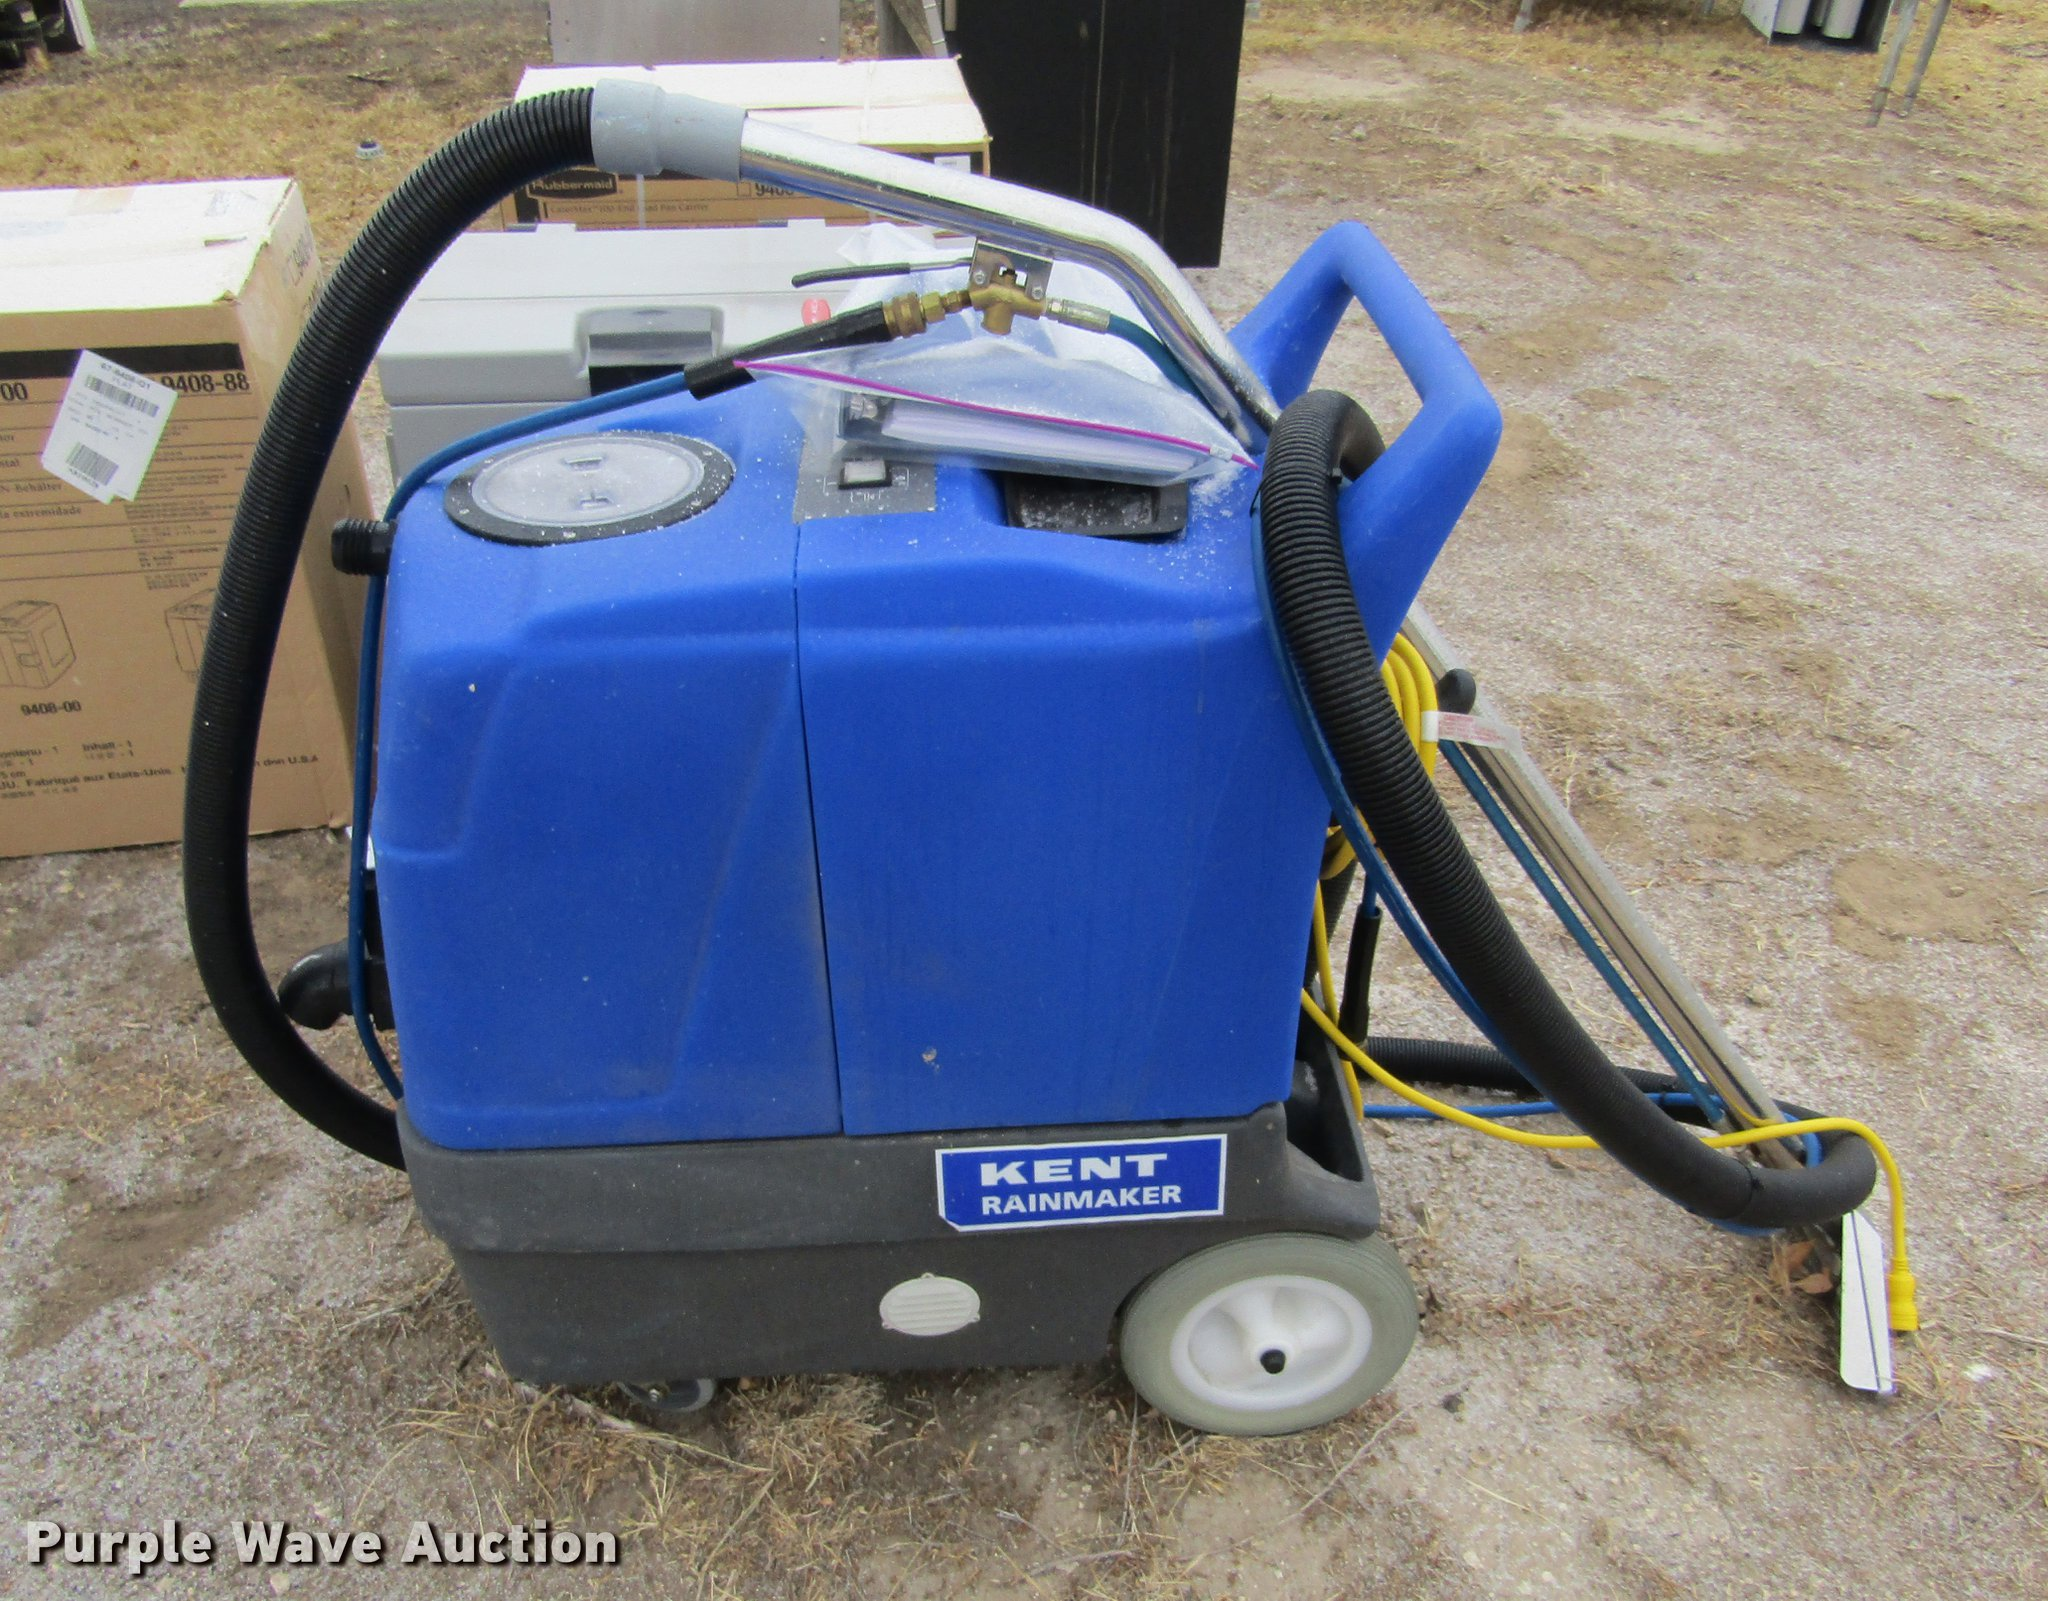 Kent Rain Maker carpet cleaner | Item DE6609 | SOLD! March 2